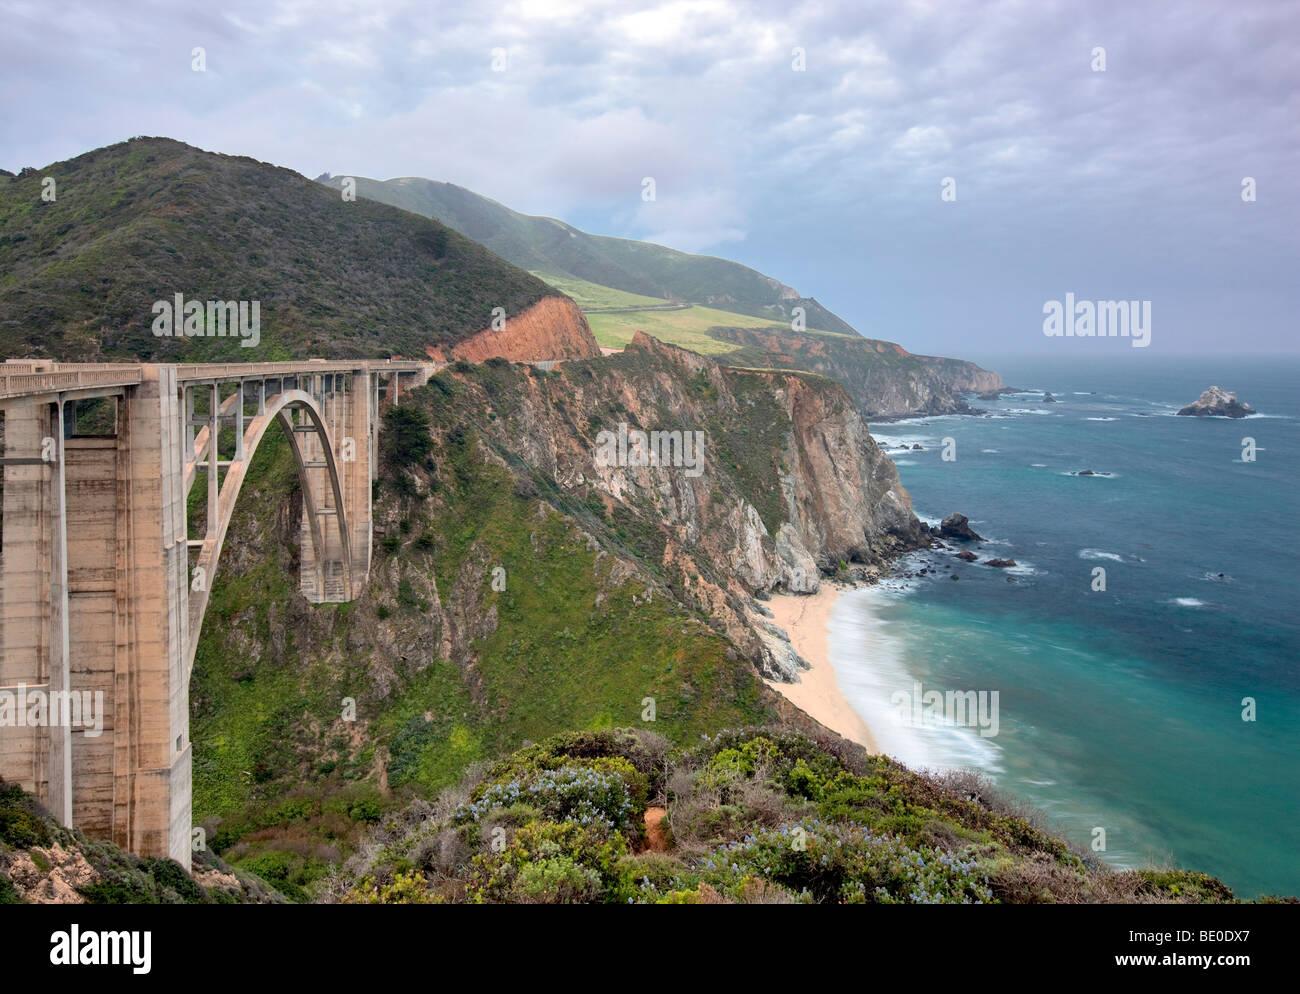 Bixby Creek Bridge. Big Sur coast. California. - Stock Image